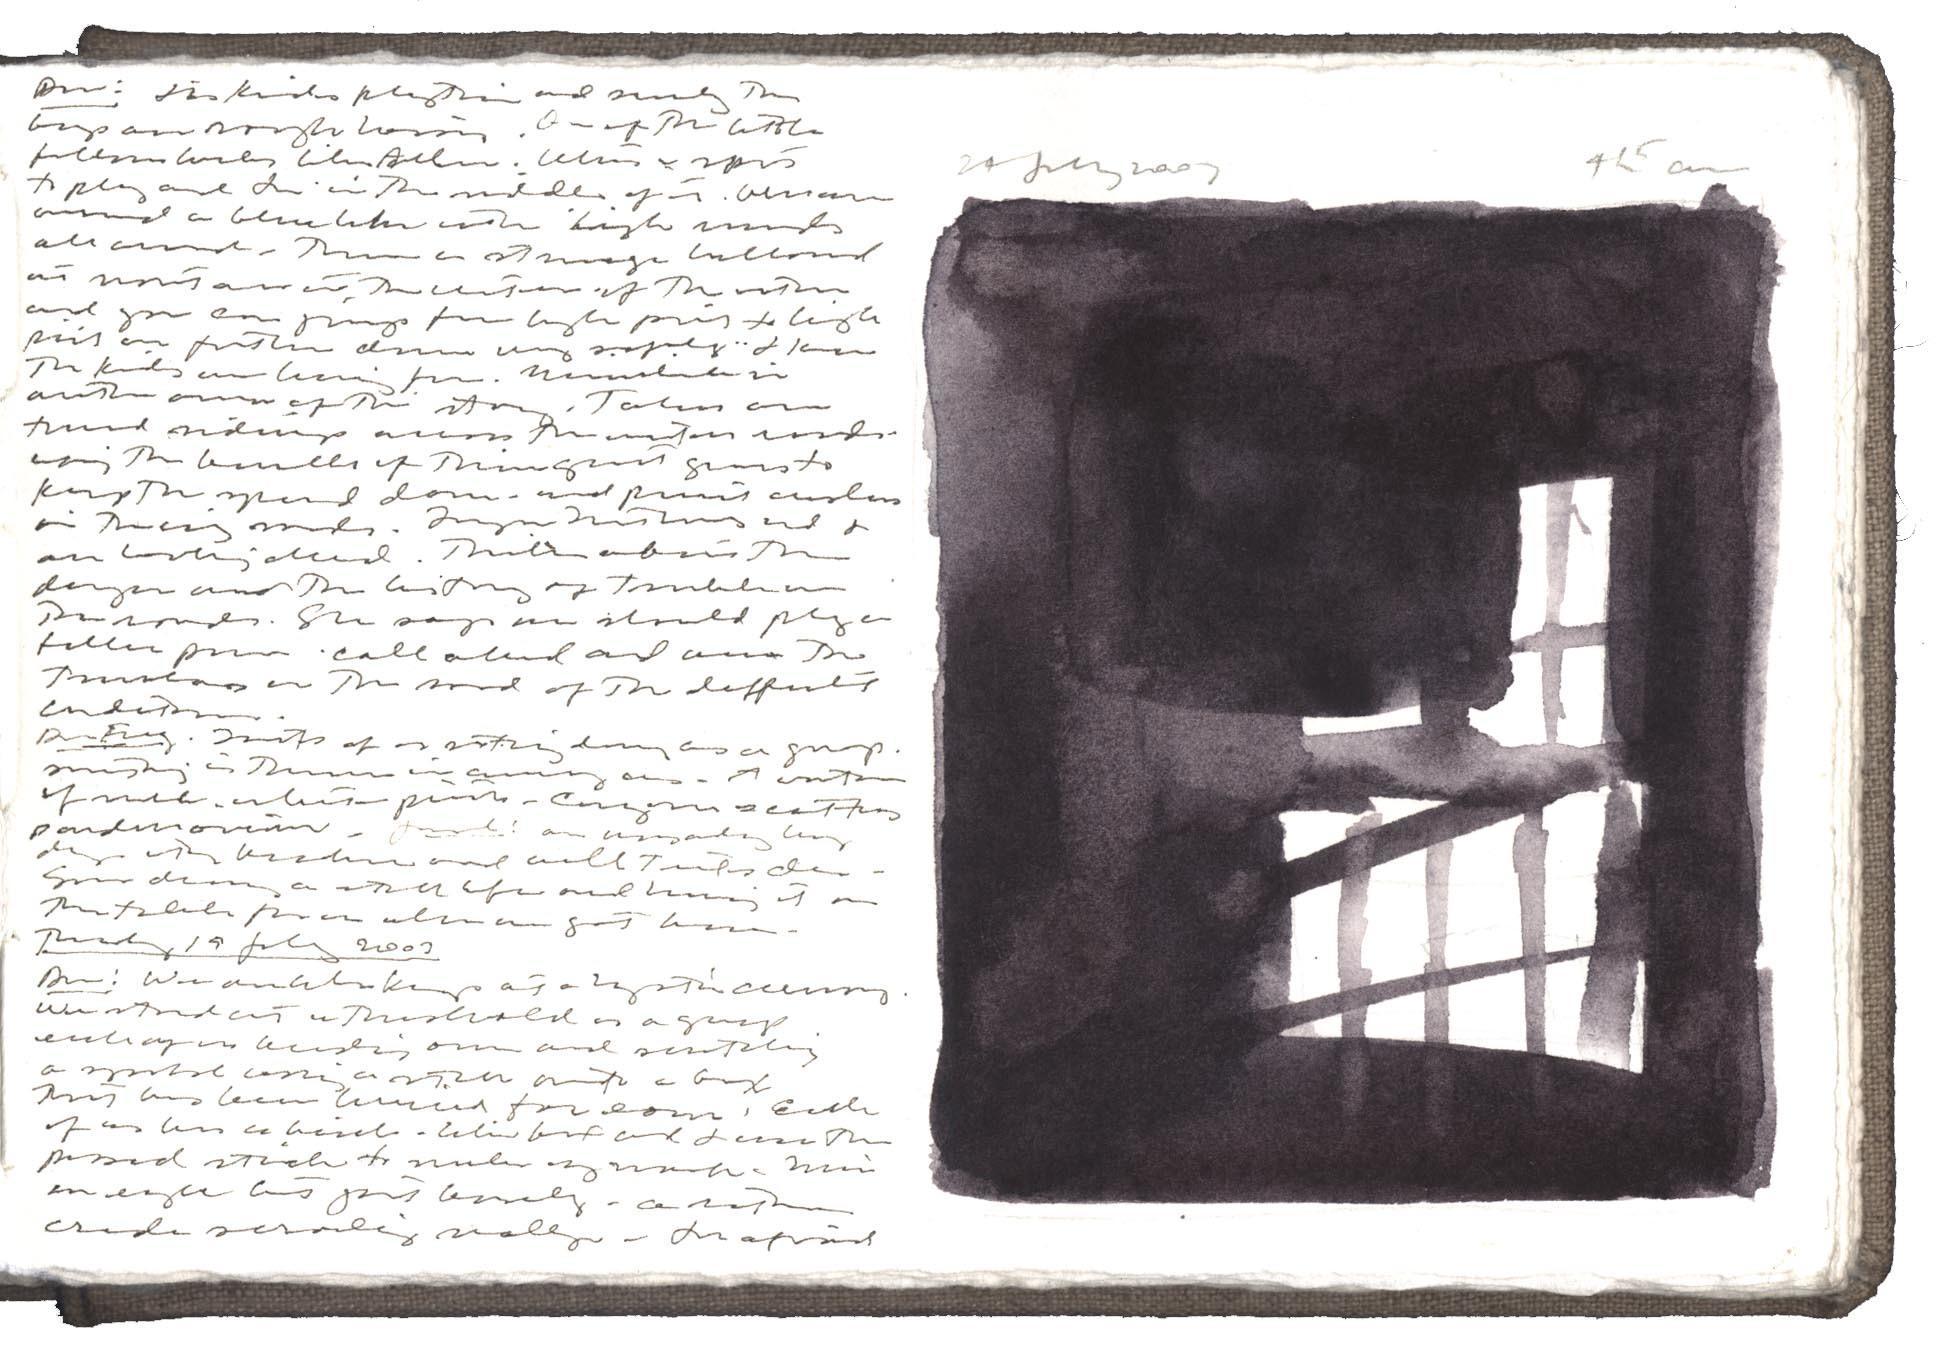 Interior Study image